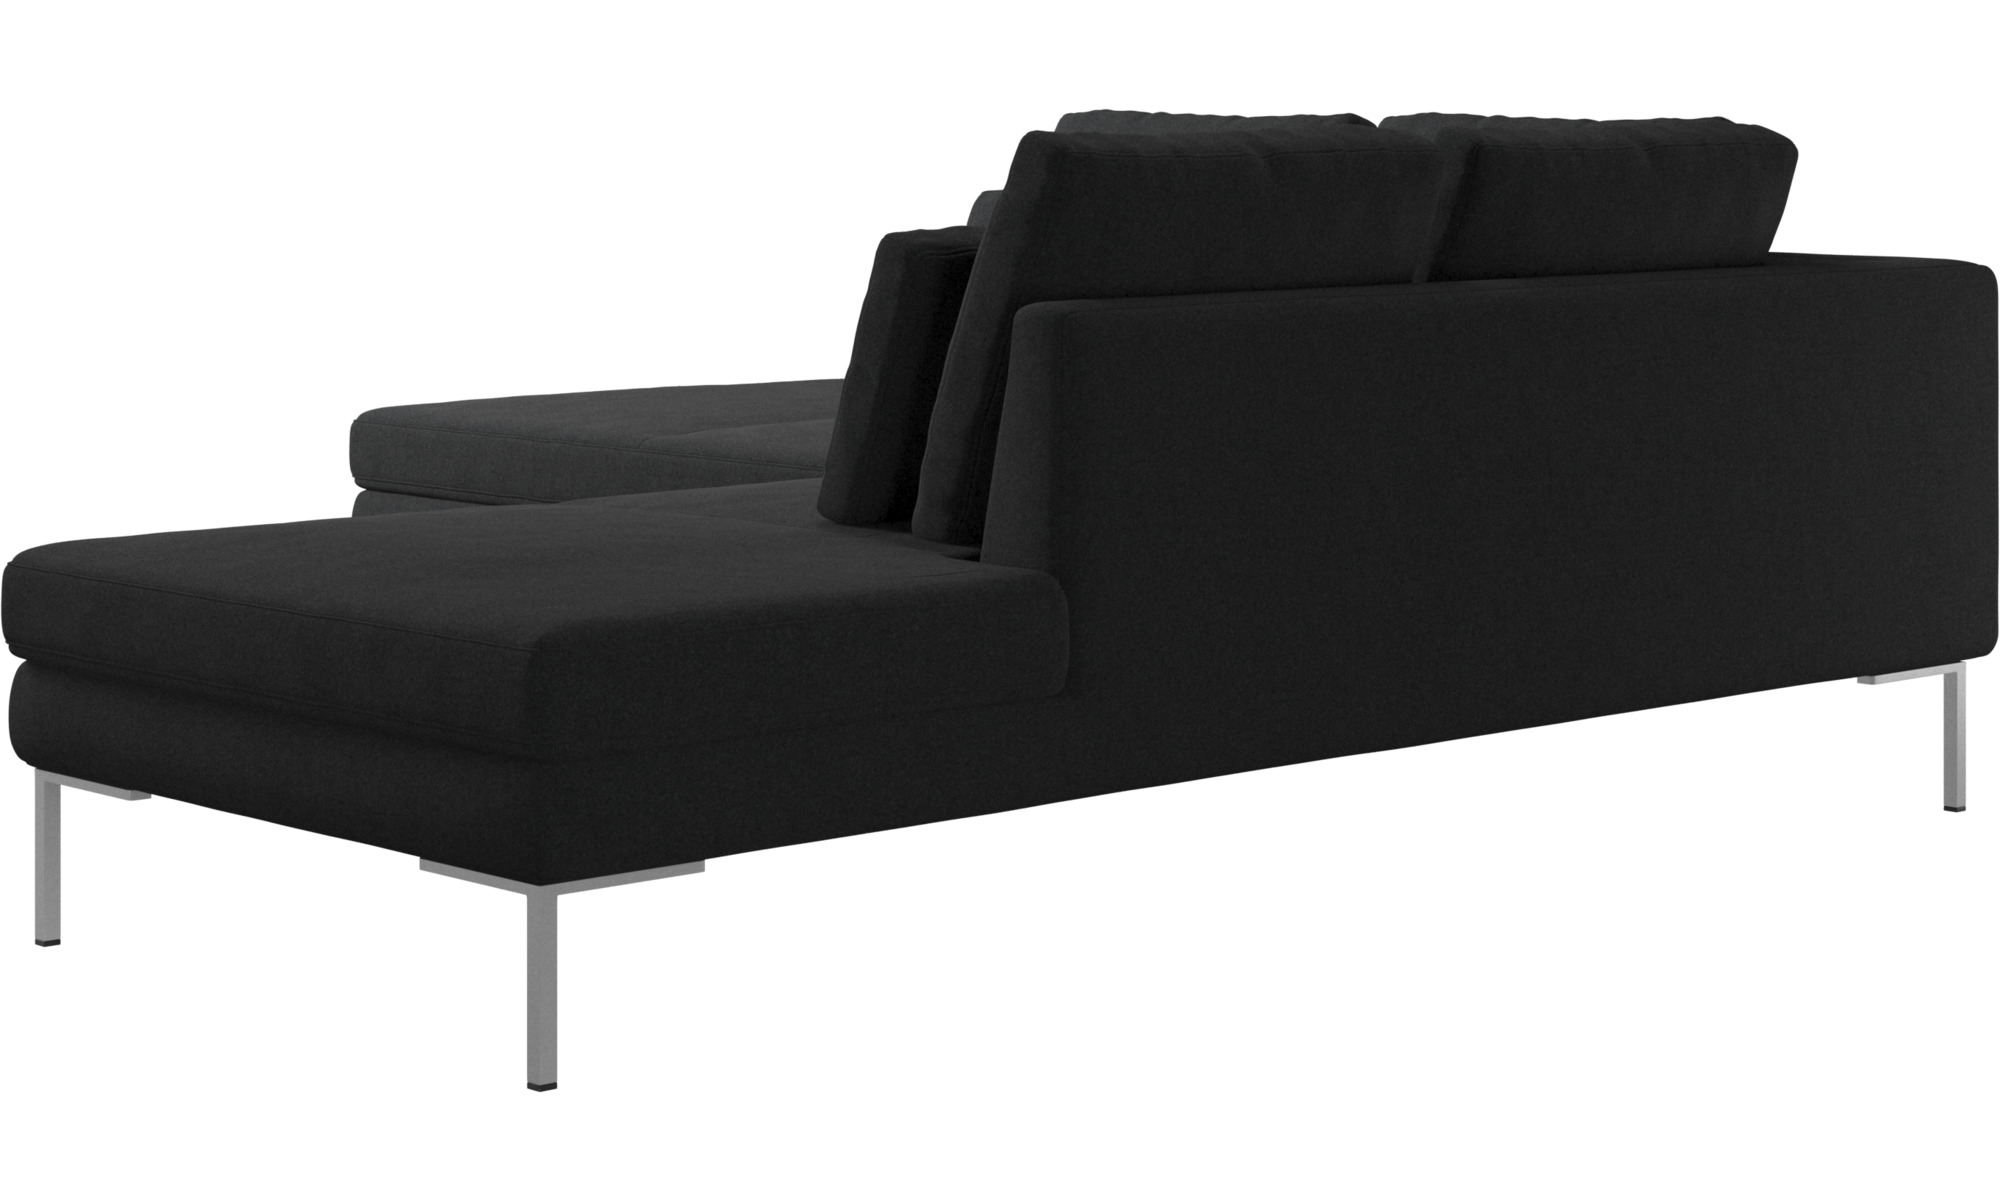 Full Size of Sofa Mit Abnehmbarem Bezug Hussen Abnehmbarer Abnehmbaren Ikea Grau Lounge Sofas Istra 2 Loungemodul Boconcept Schlaffunktion Chesterfield Delife Koinor Big Sofa Sofa Abnehmbarer Bezug